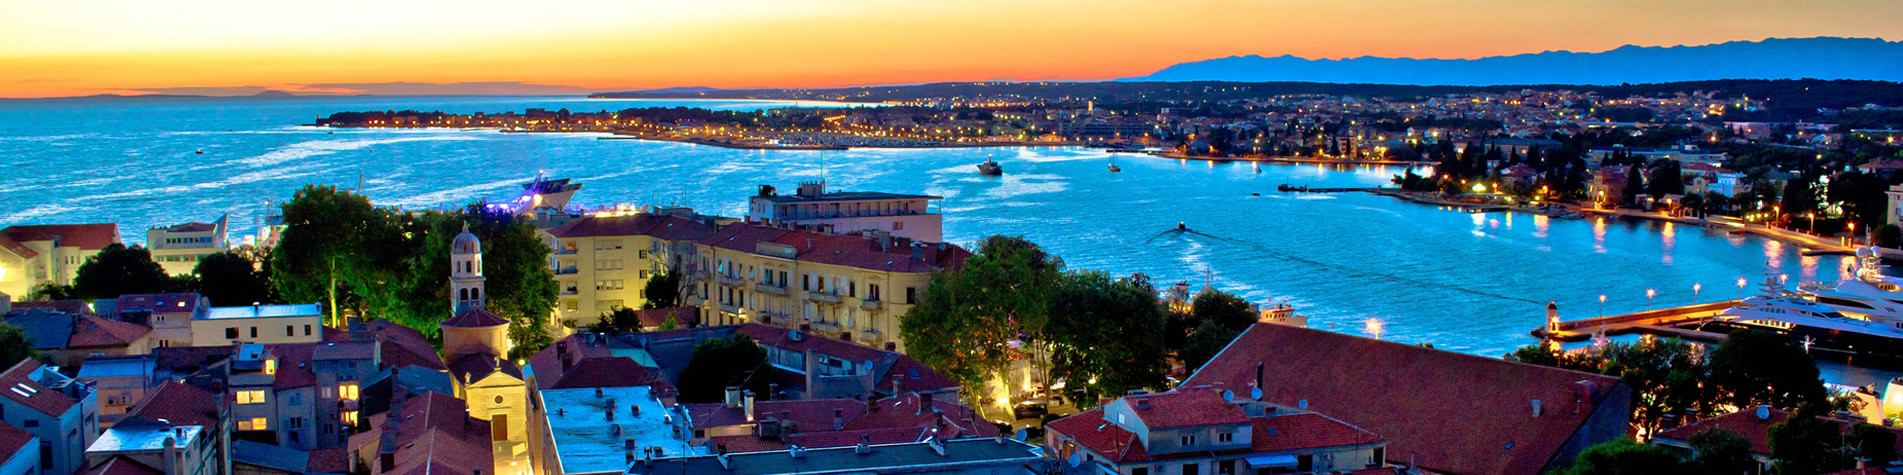 Zadar Holidays with Cyplon Holidays